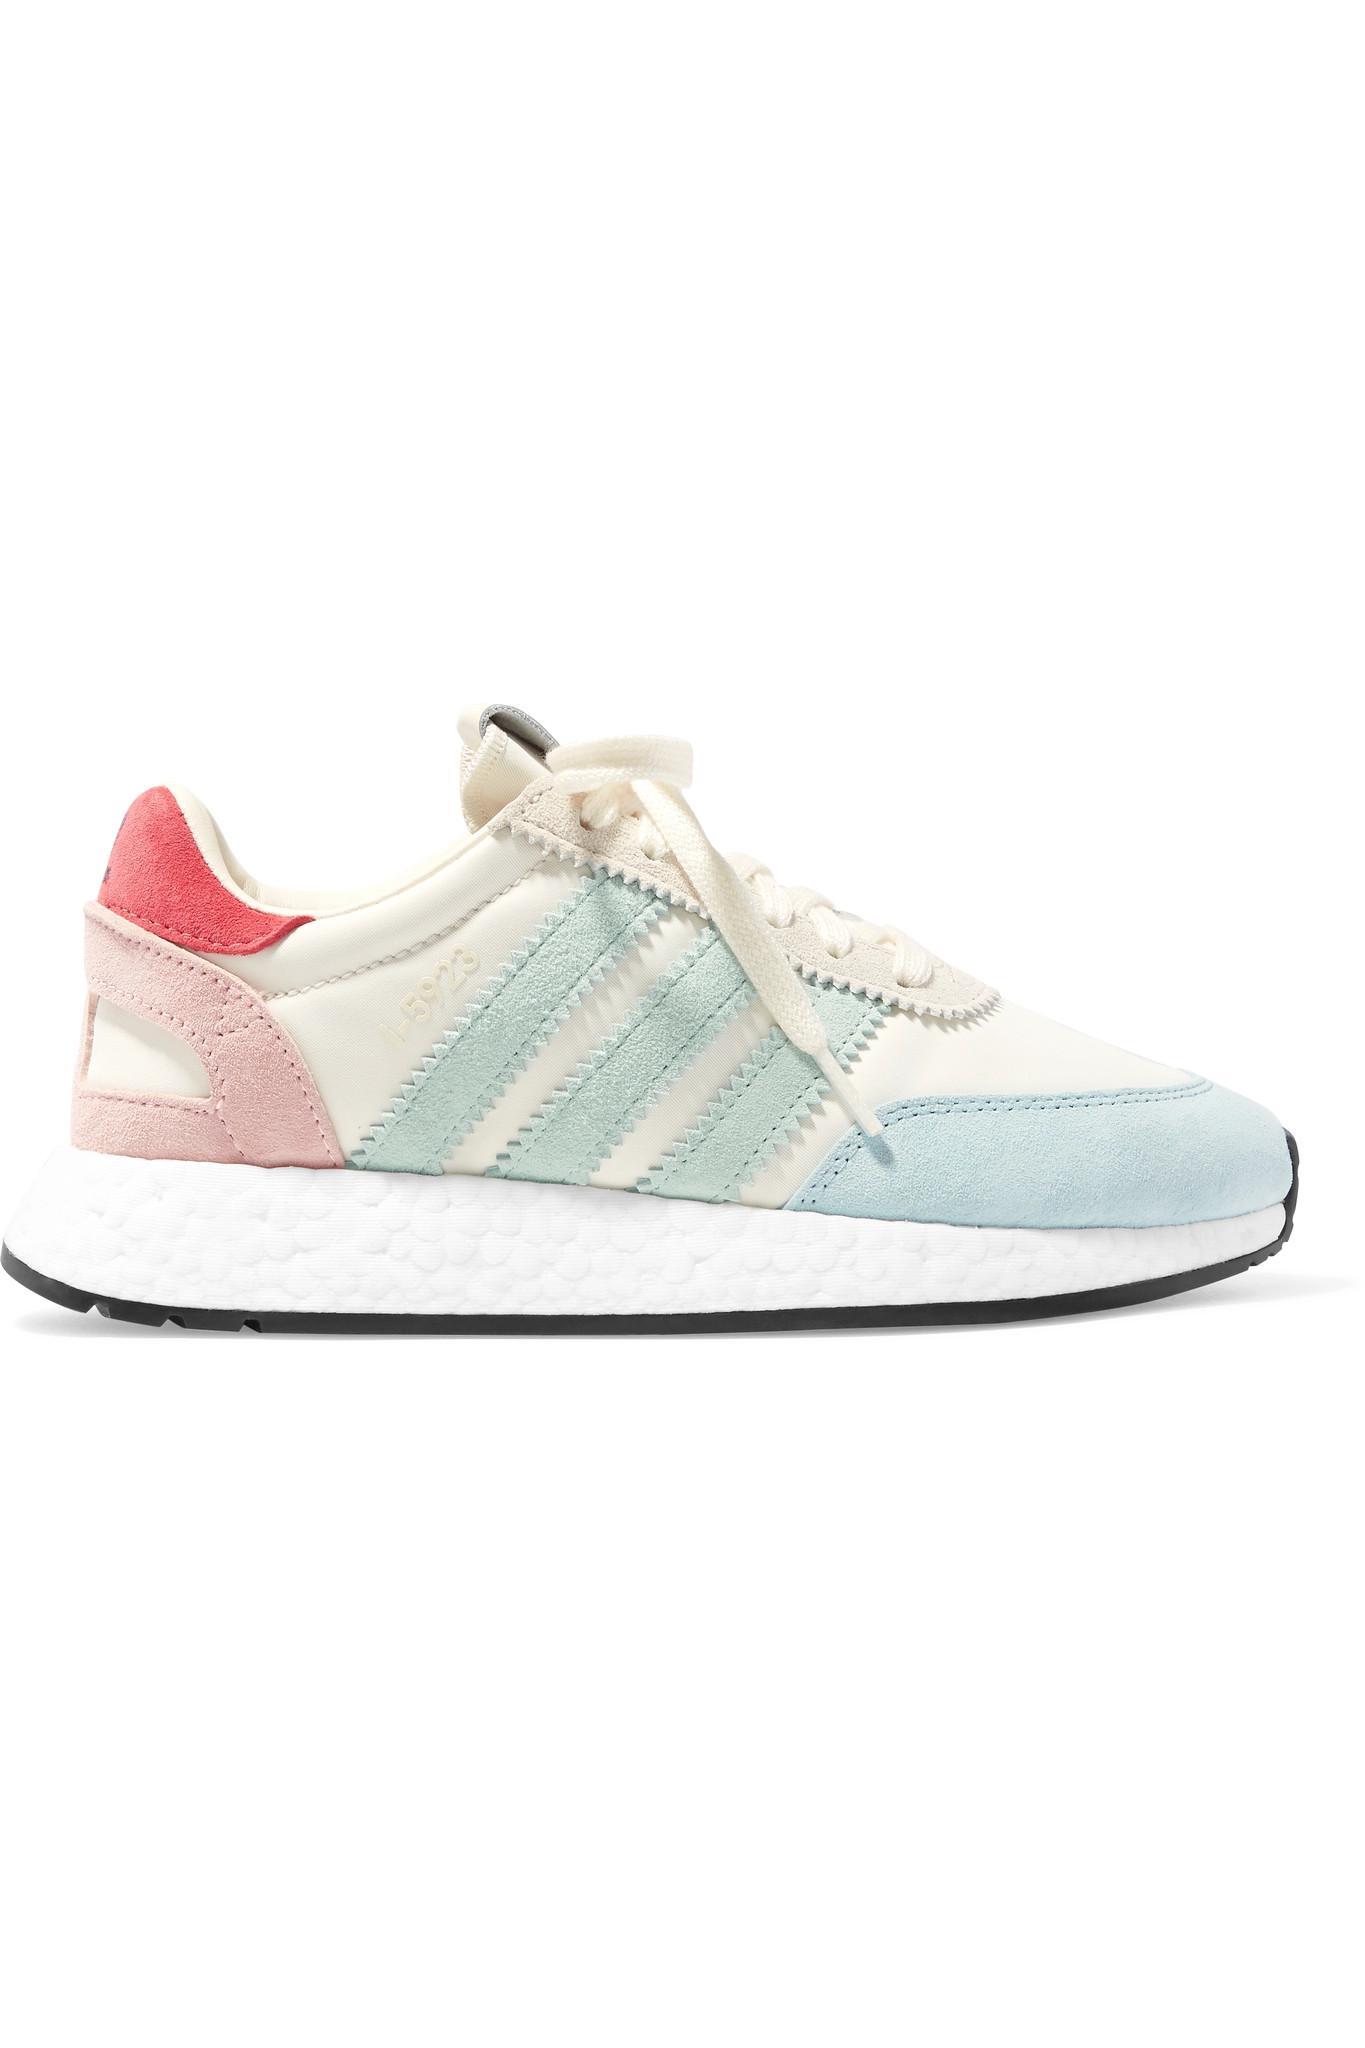 I-5923 Pride Suede-trimmed Canvas Sneakers - Blue adidas Originals Eb2joPQQUl